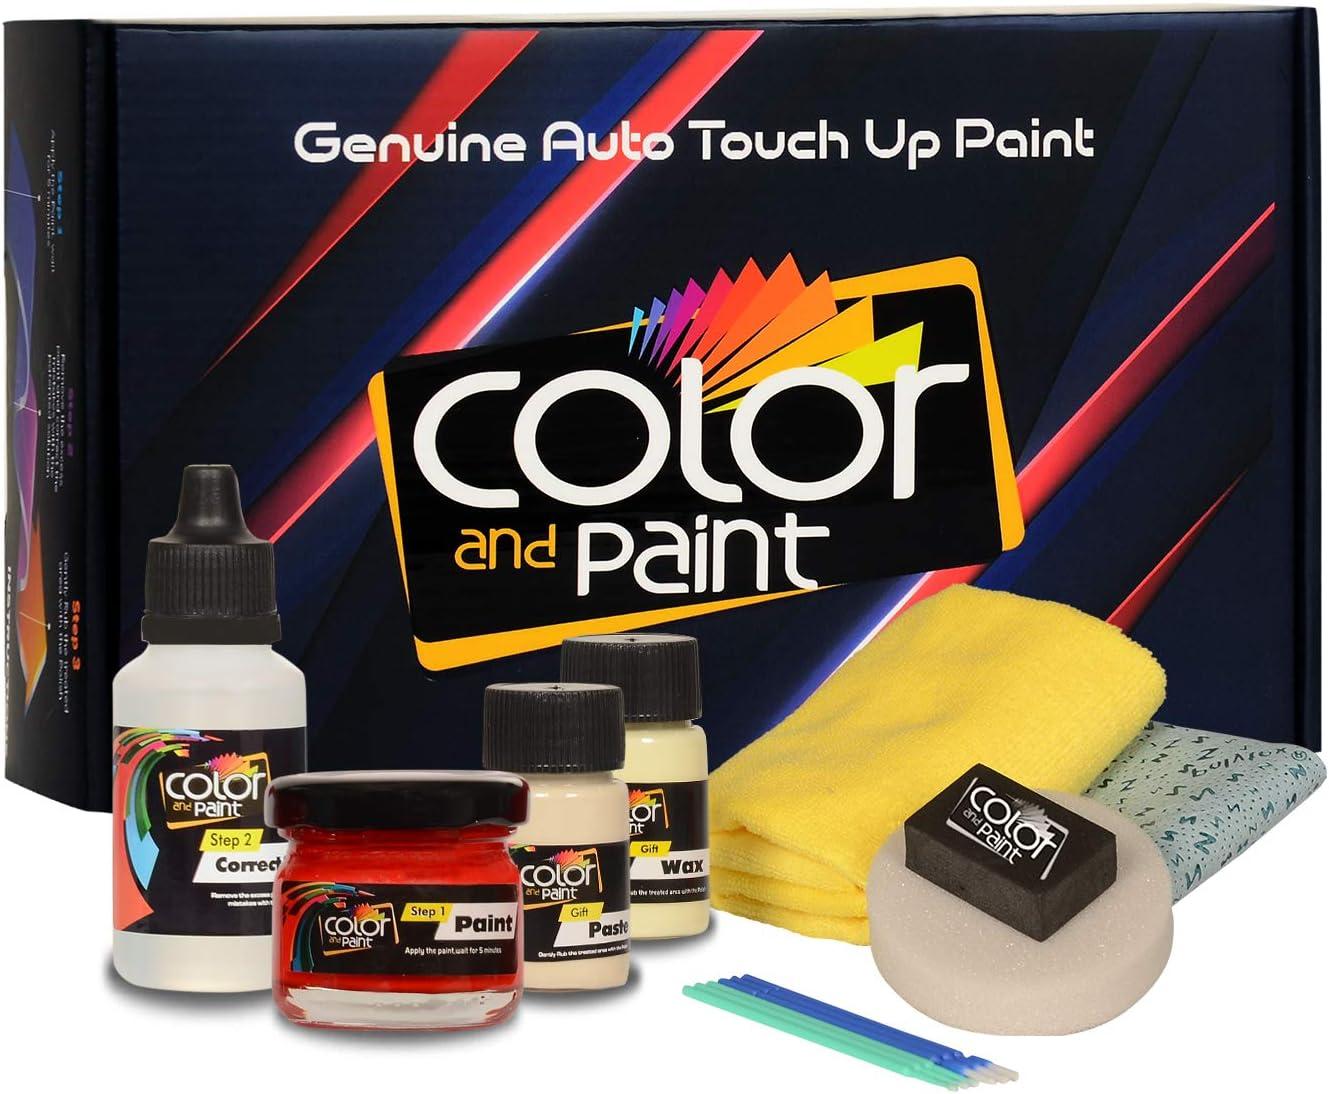 Color And Paint Compatible con/Chrysler 200 / Mineral Grey Met - CDM/Touch-UP Sistema DE Pintura Coincidencia EXACTA/Basic Care